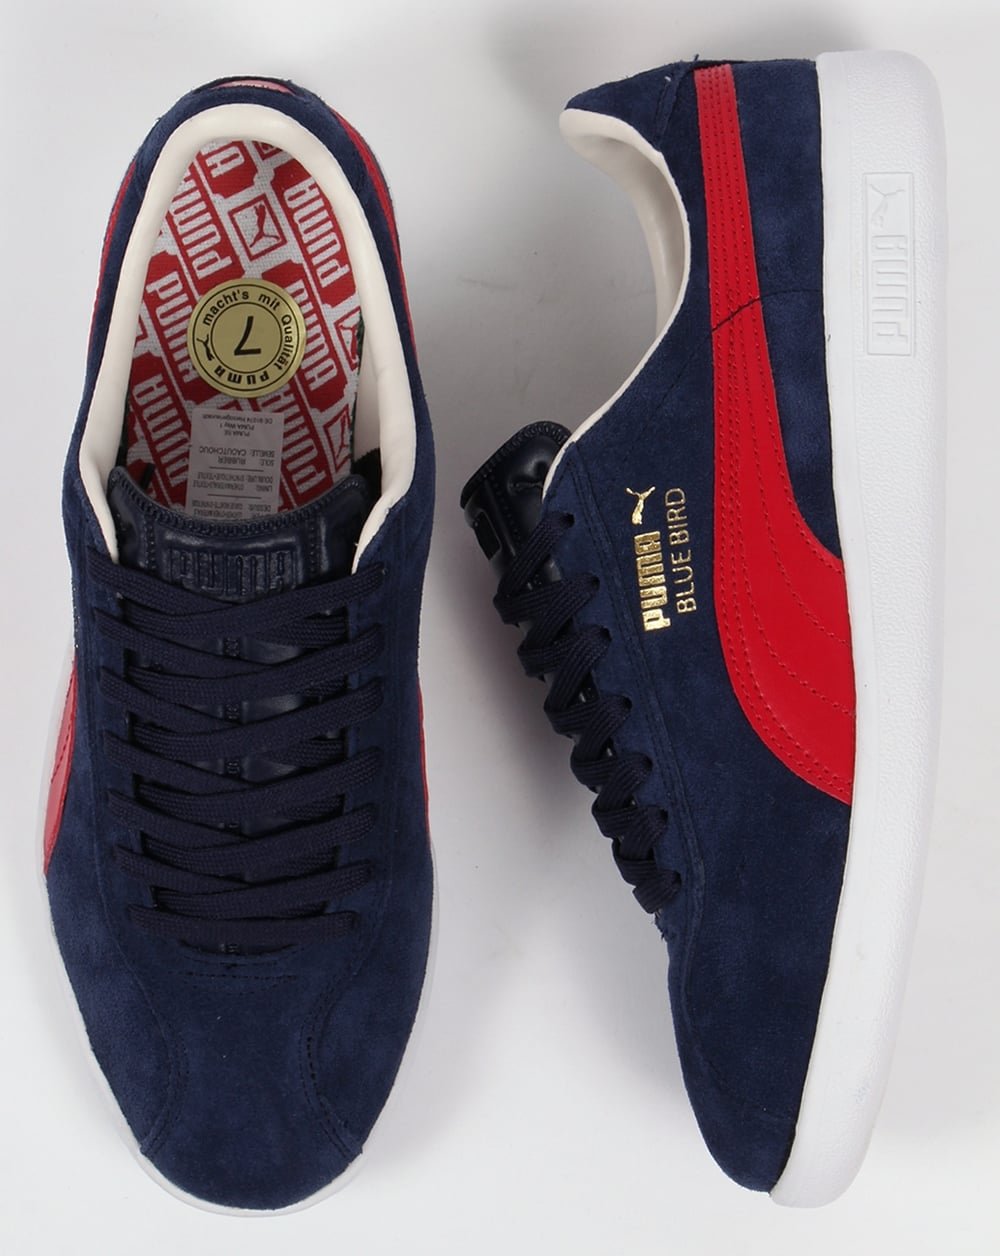 Puma Bluebird Trainers Navy/Red